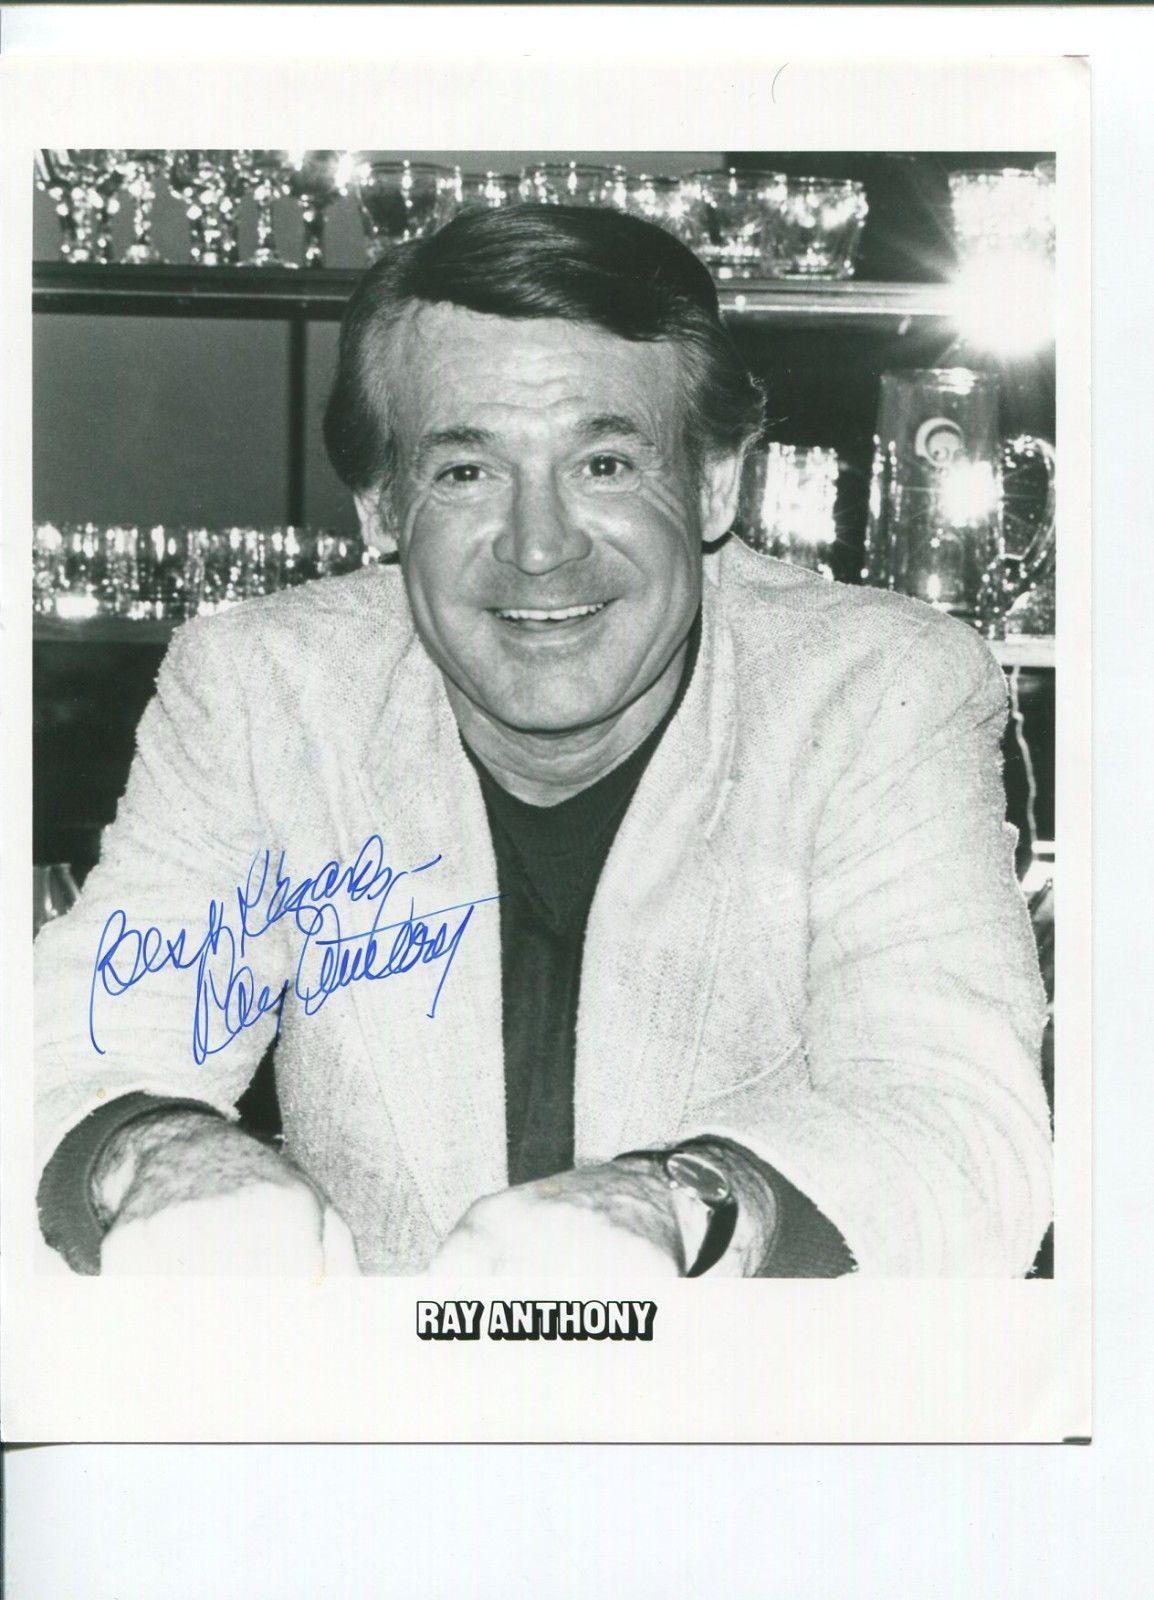 Ray Anthony Jazz Big Band Great Signed Autograph Photo